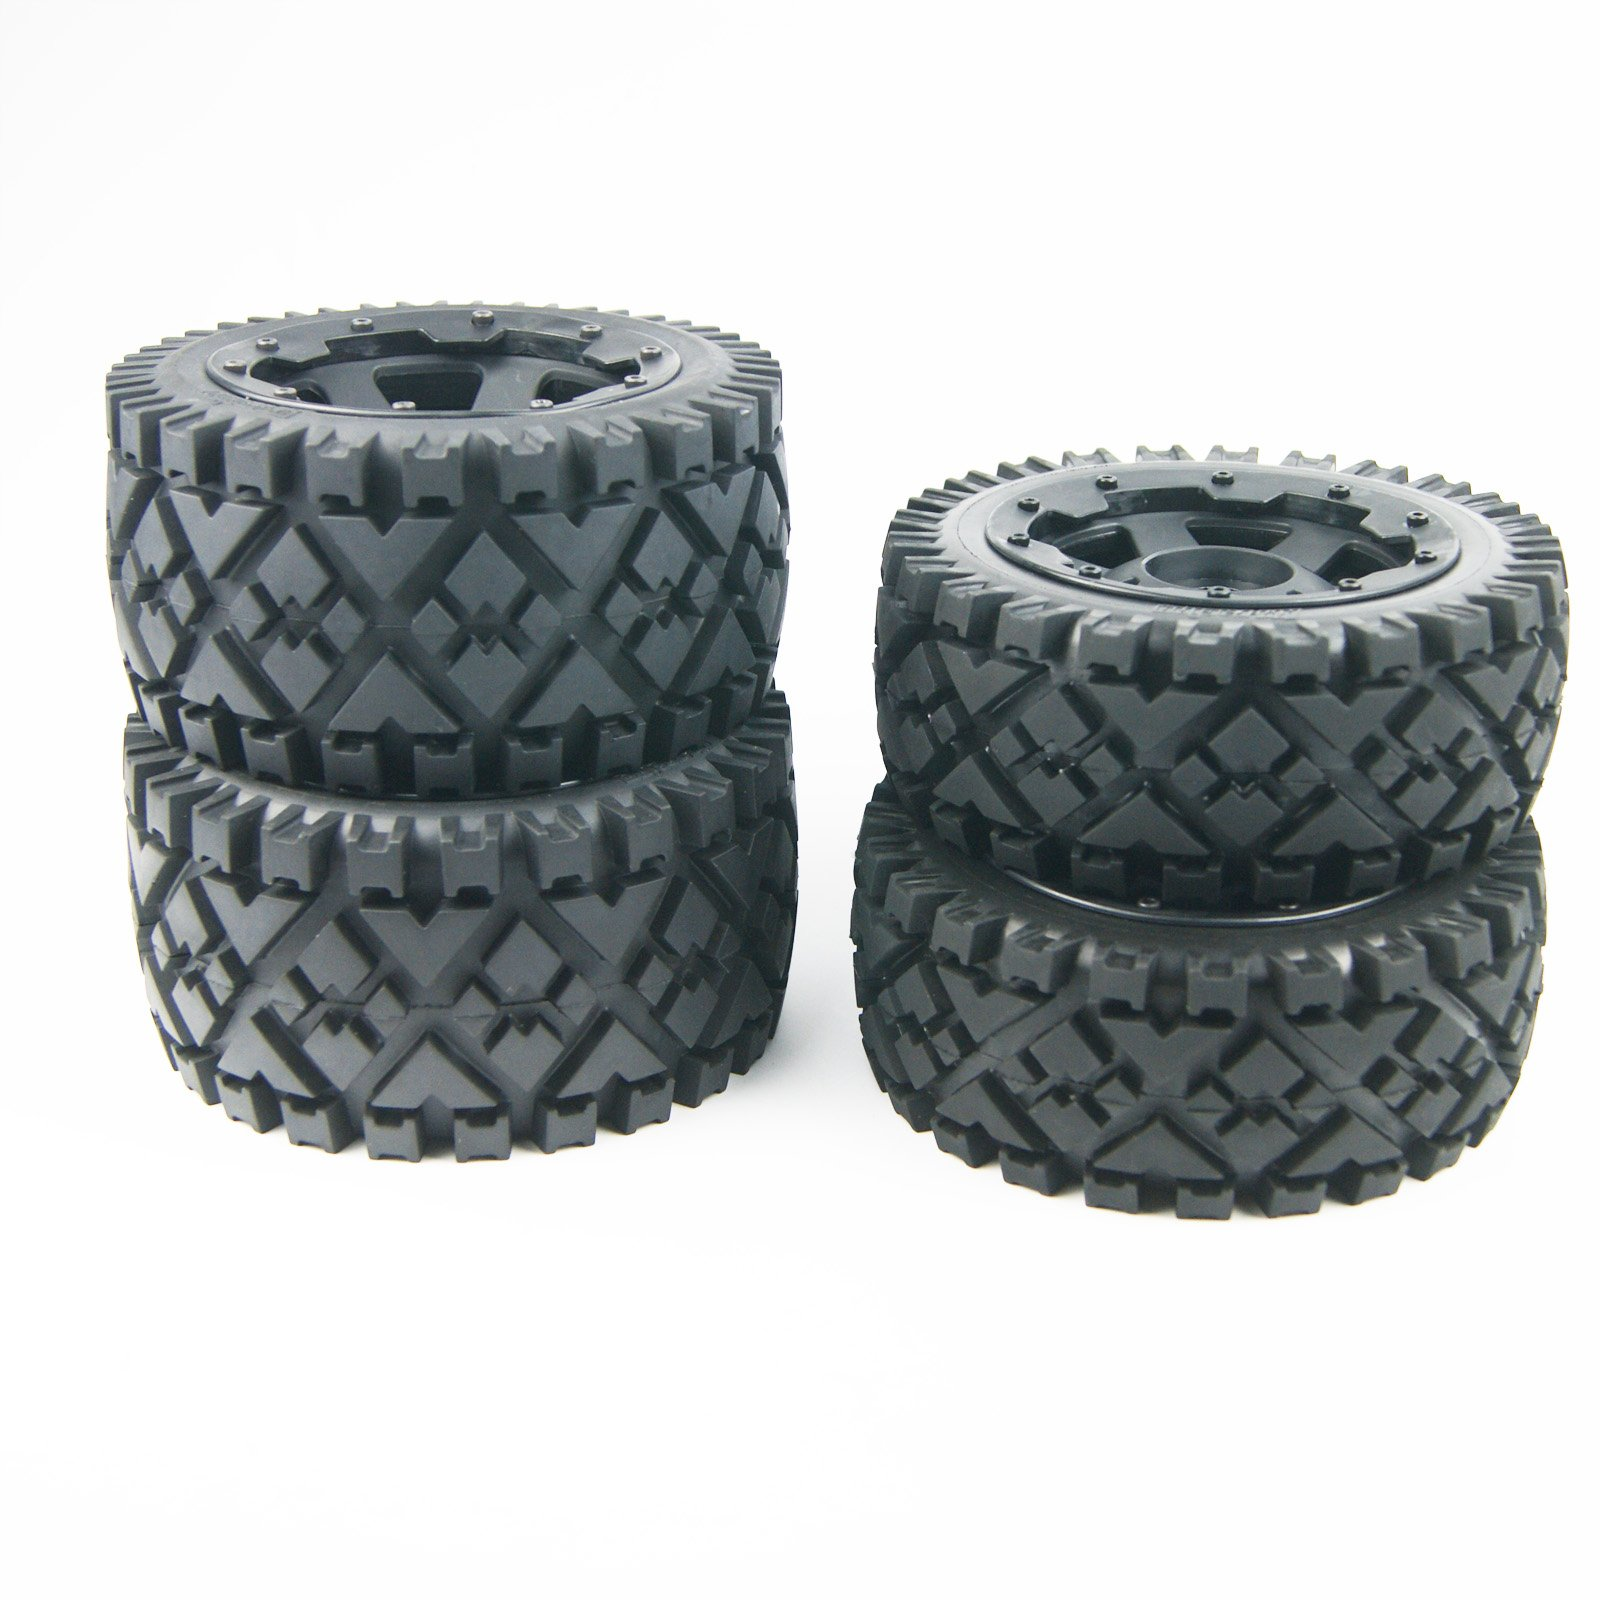 Front Rear All Terrain Tyre tire Wheel for Rovan King Motor HPI baja 5b SS